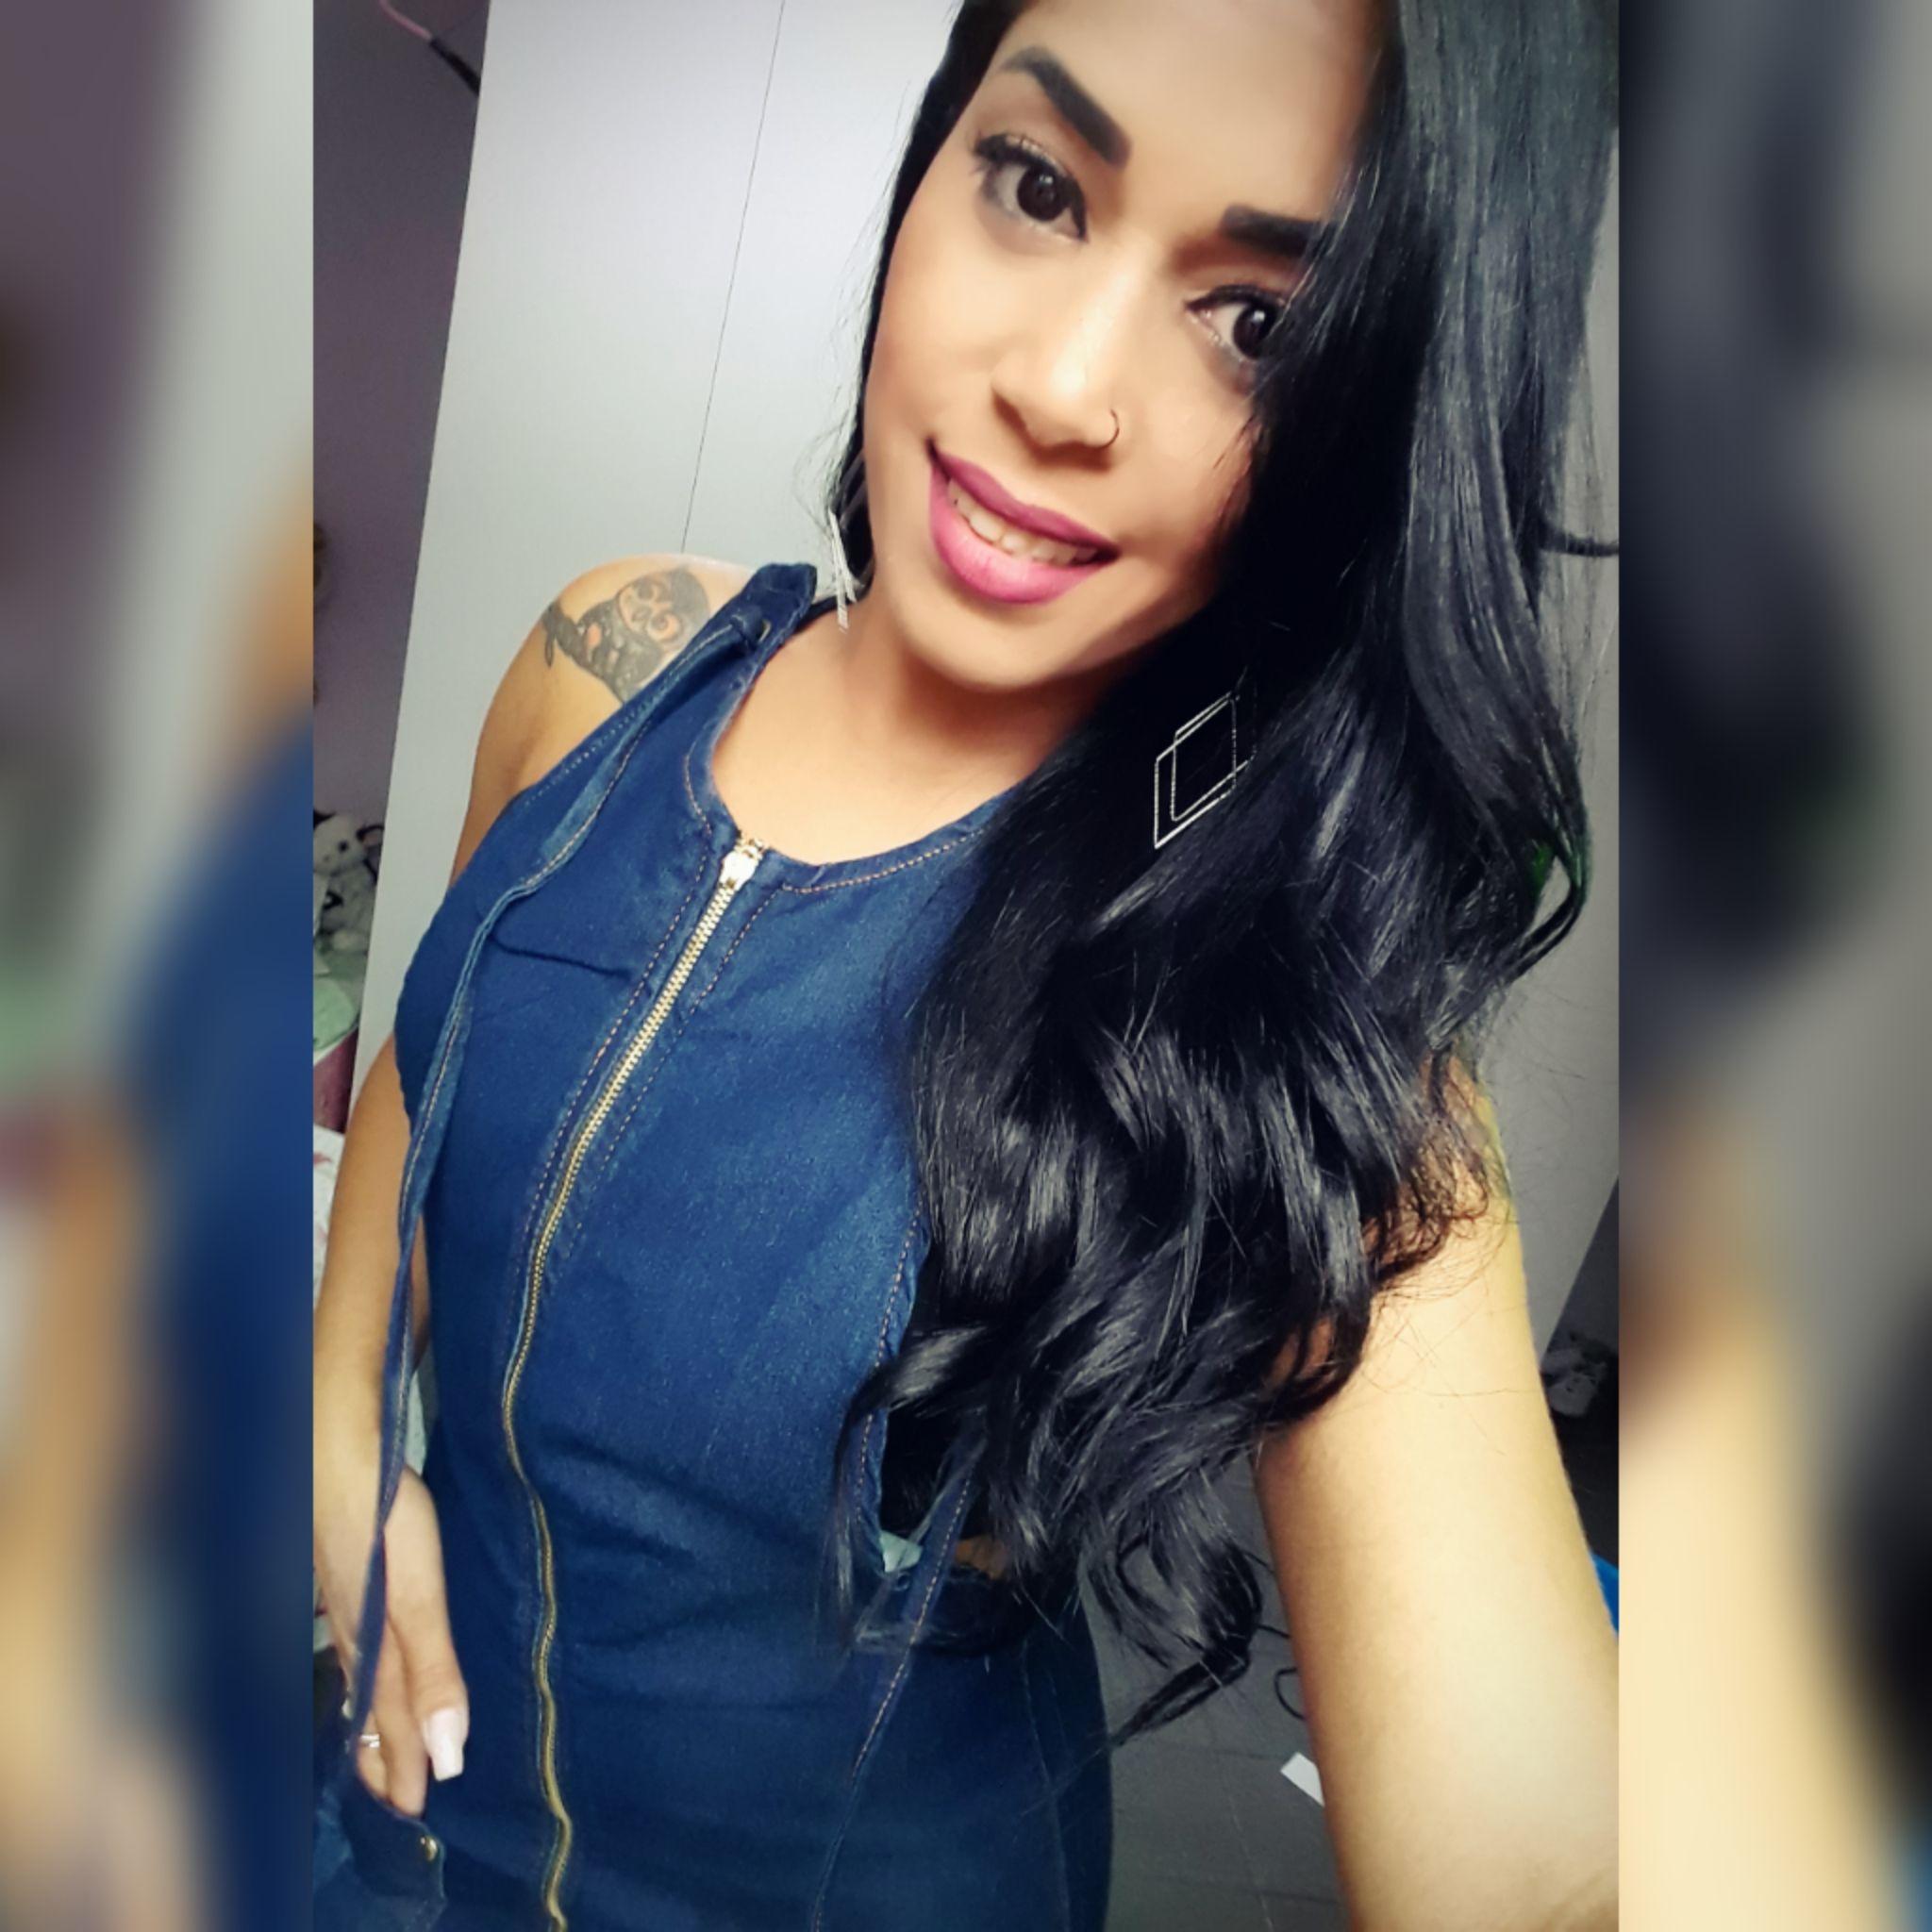 Maísa Carvalho Unha